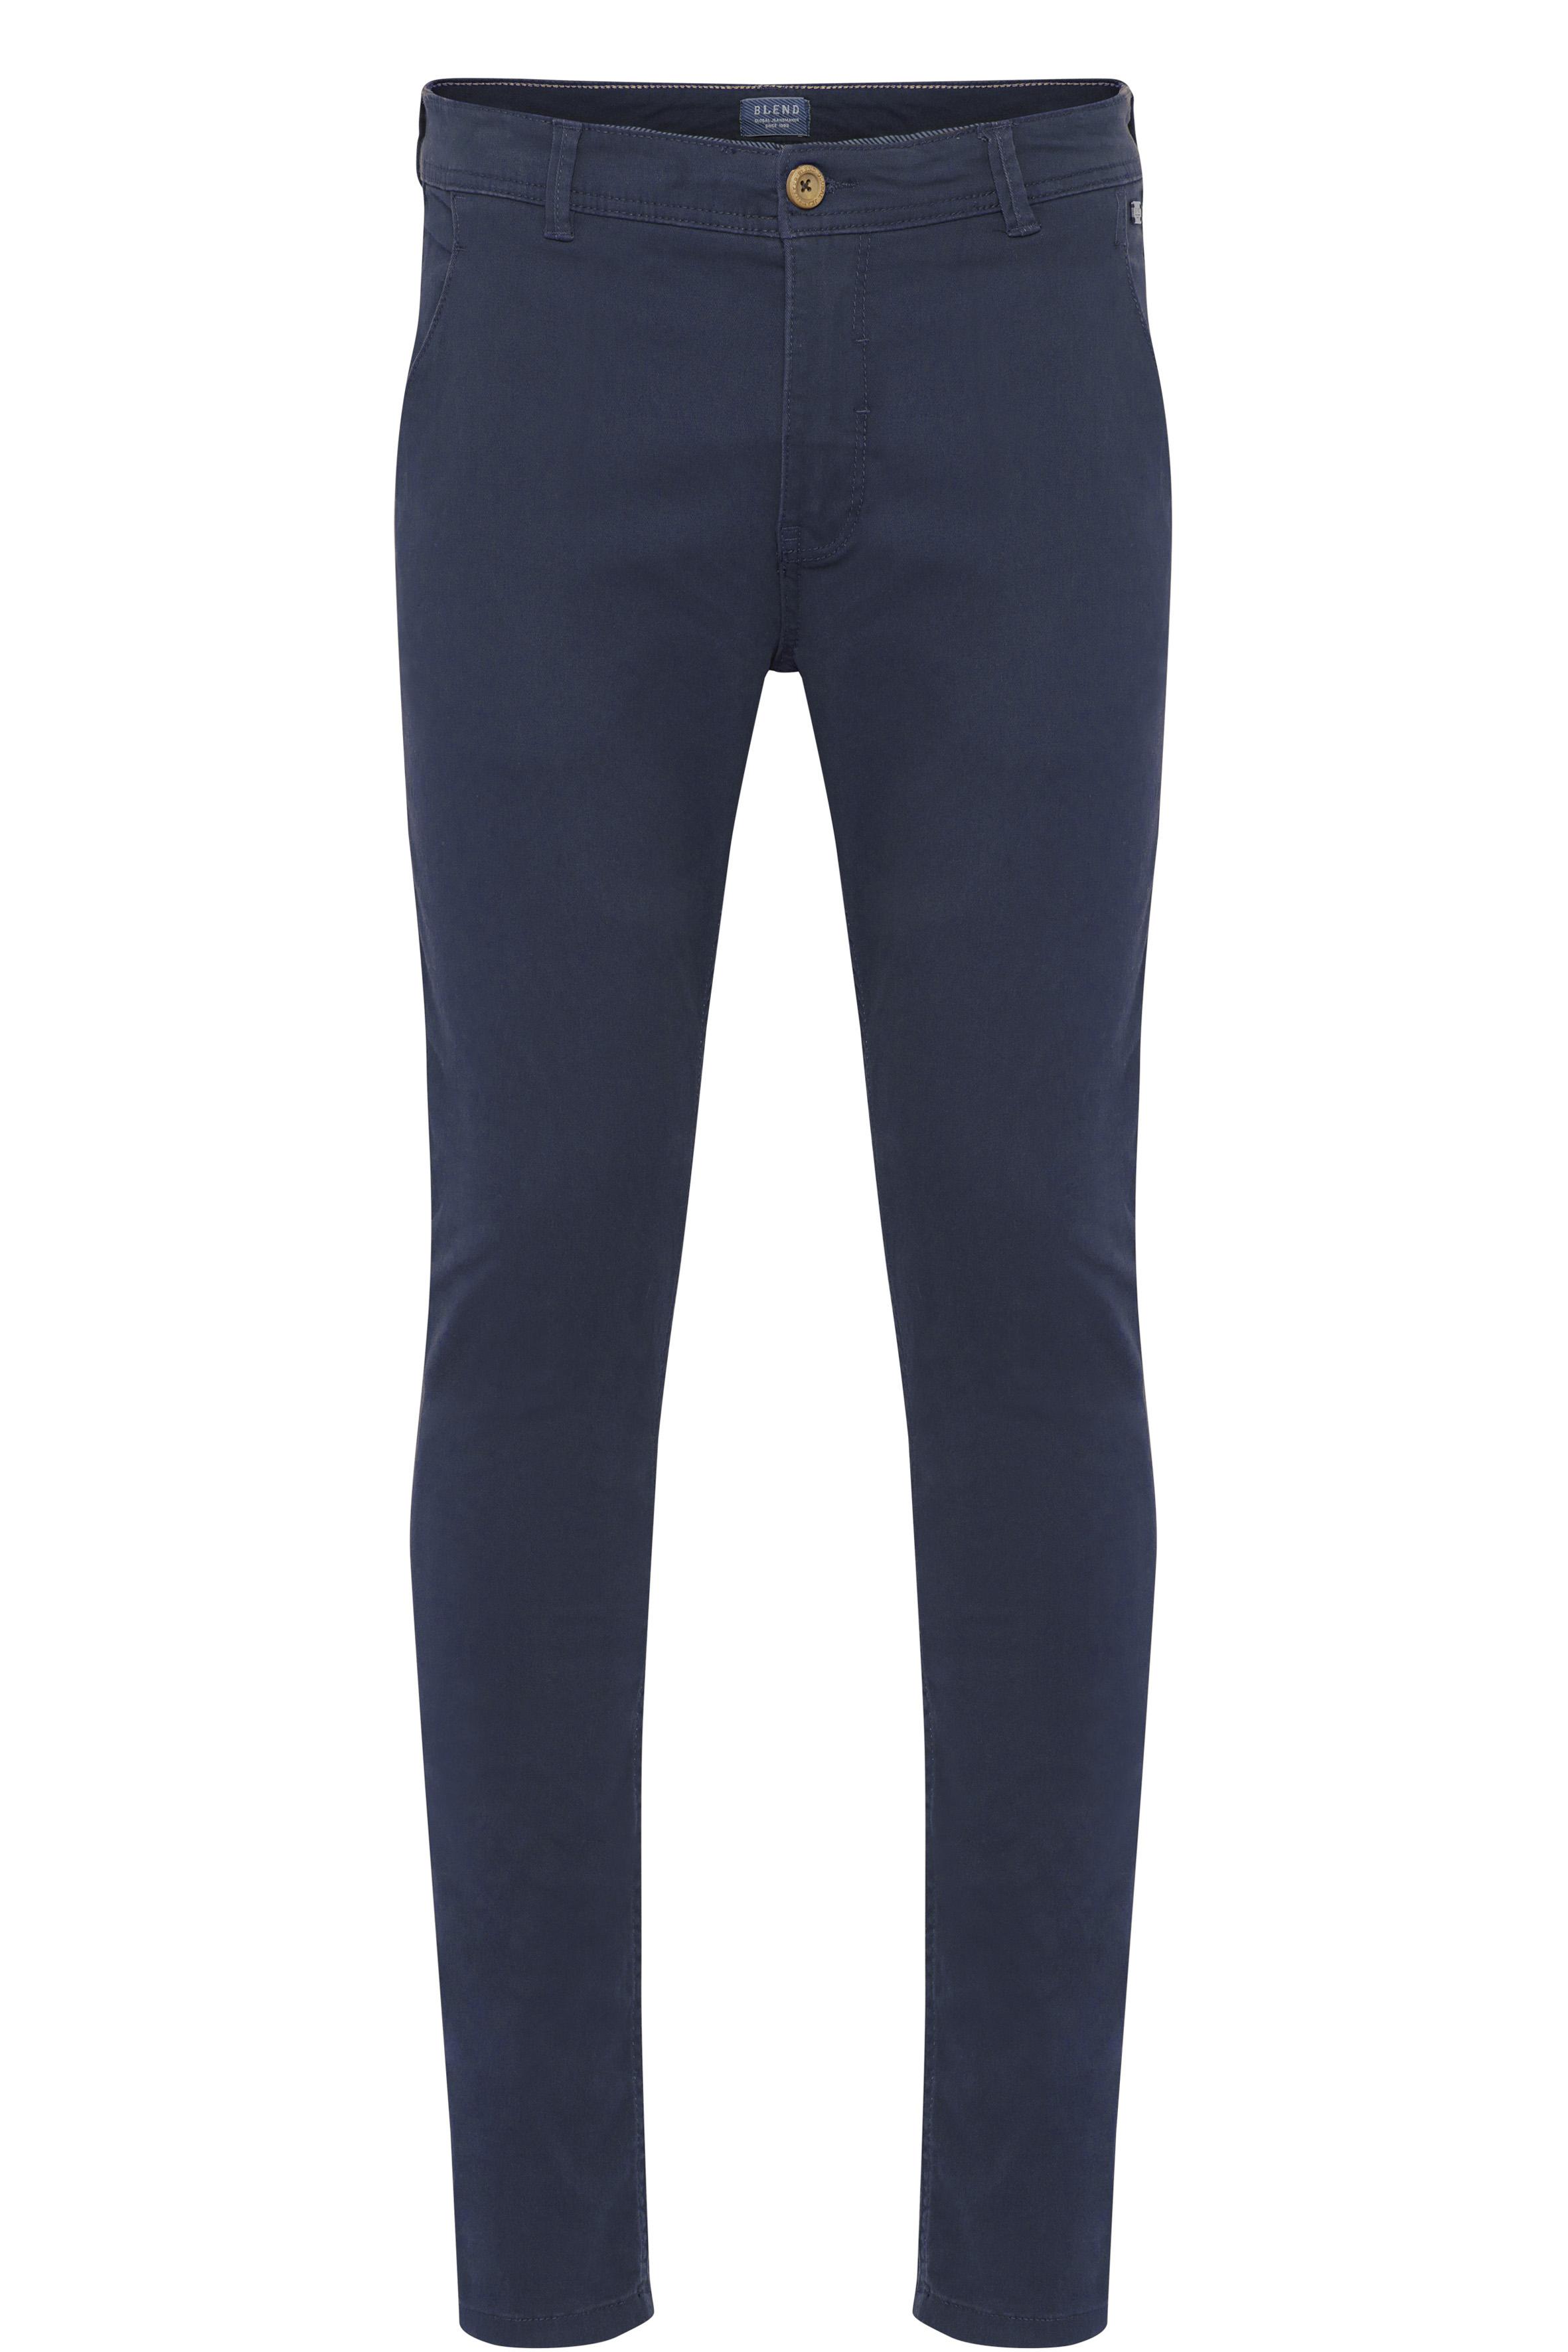 Navy Pants Casual – Køb Navy Pants Casual fra str. 28-38 her